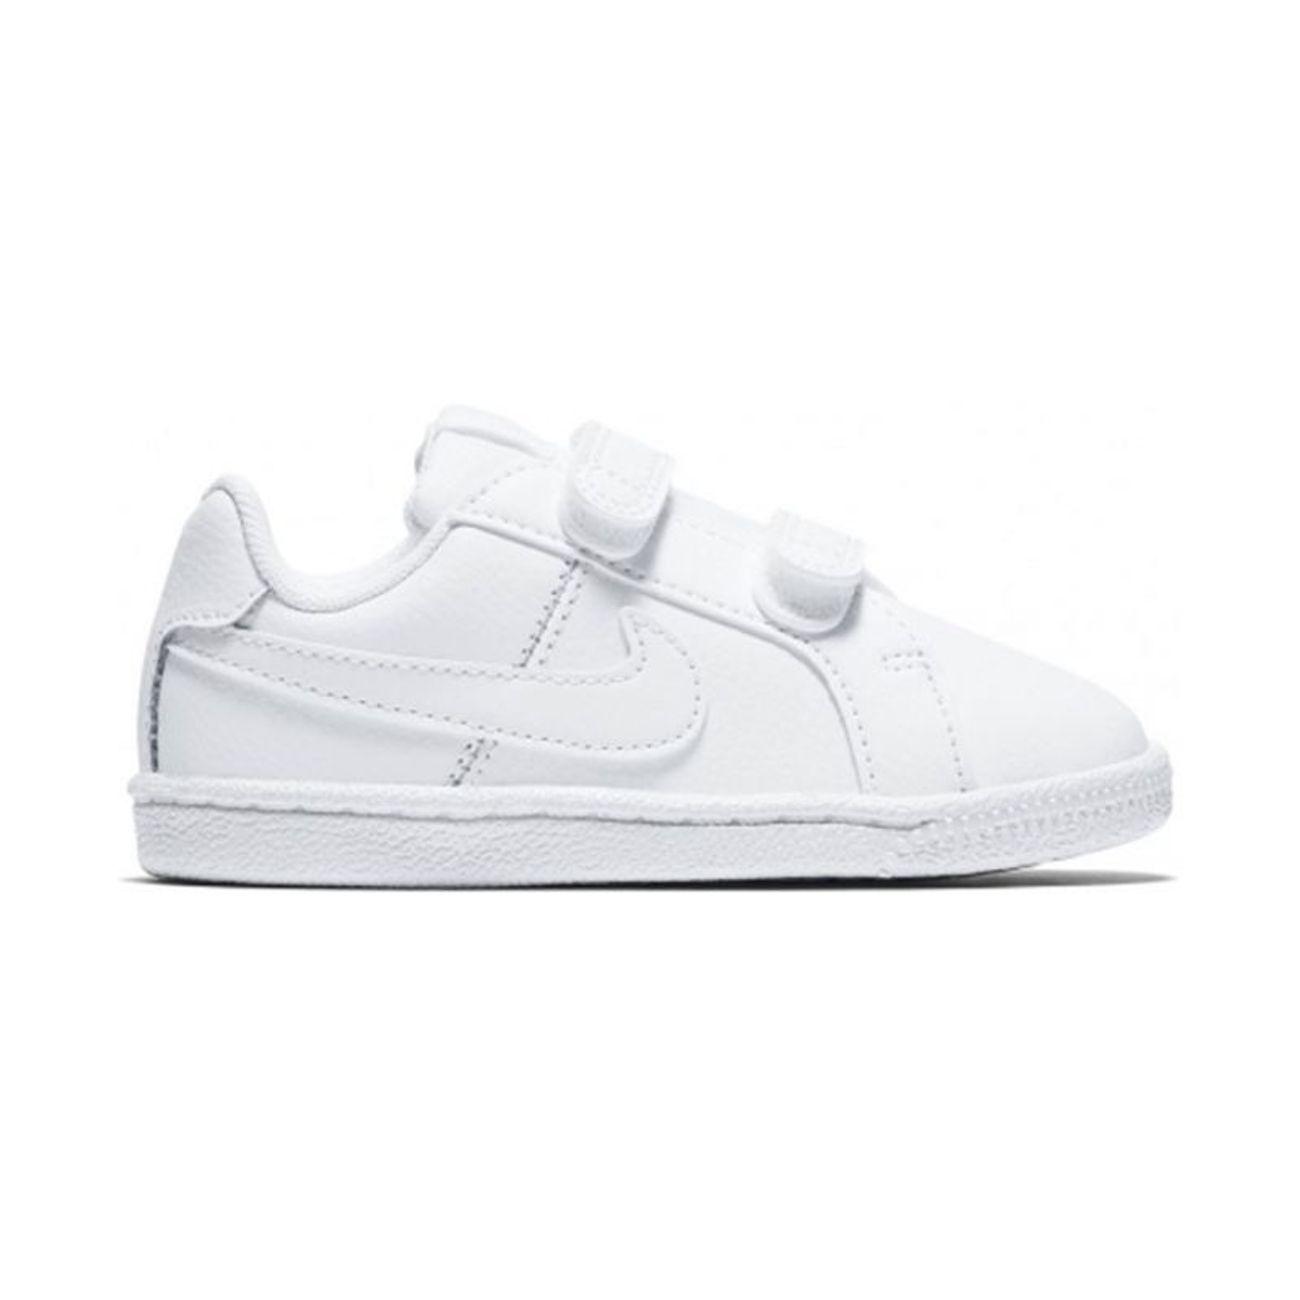 Junior Blanco Court Adulte Padel Royale Ni833537 102 Nike rCxWEdoQeB